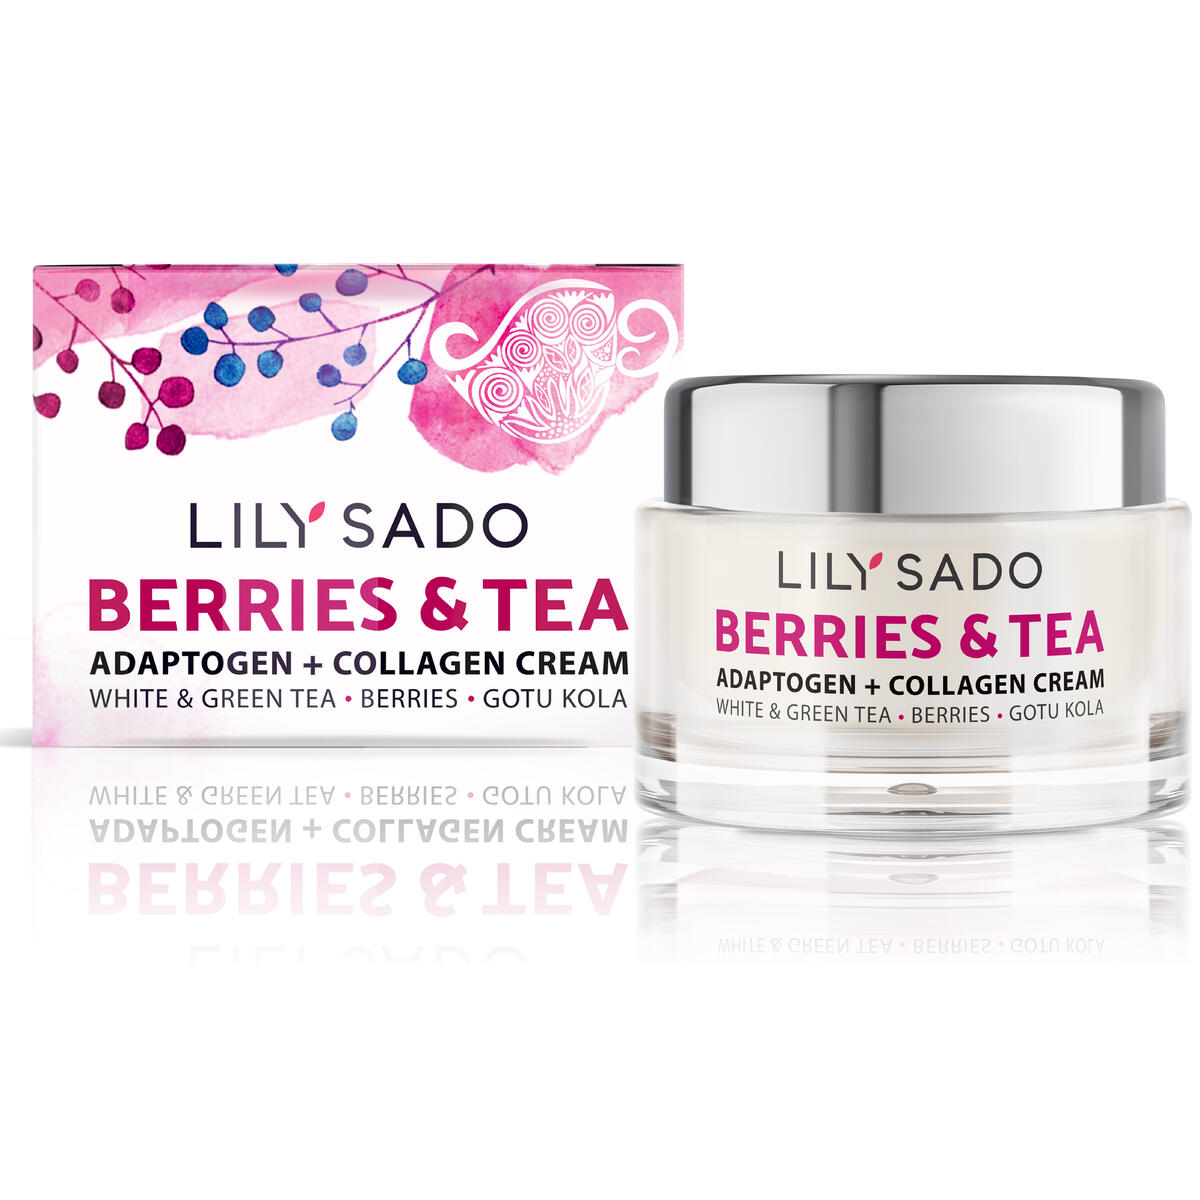 LILY SADO BERRIES & TEA Adaptogen and Collagen Moisturizer